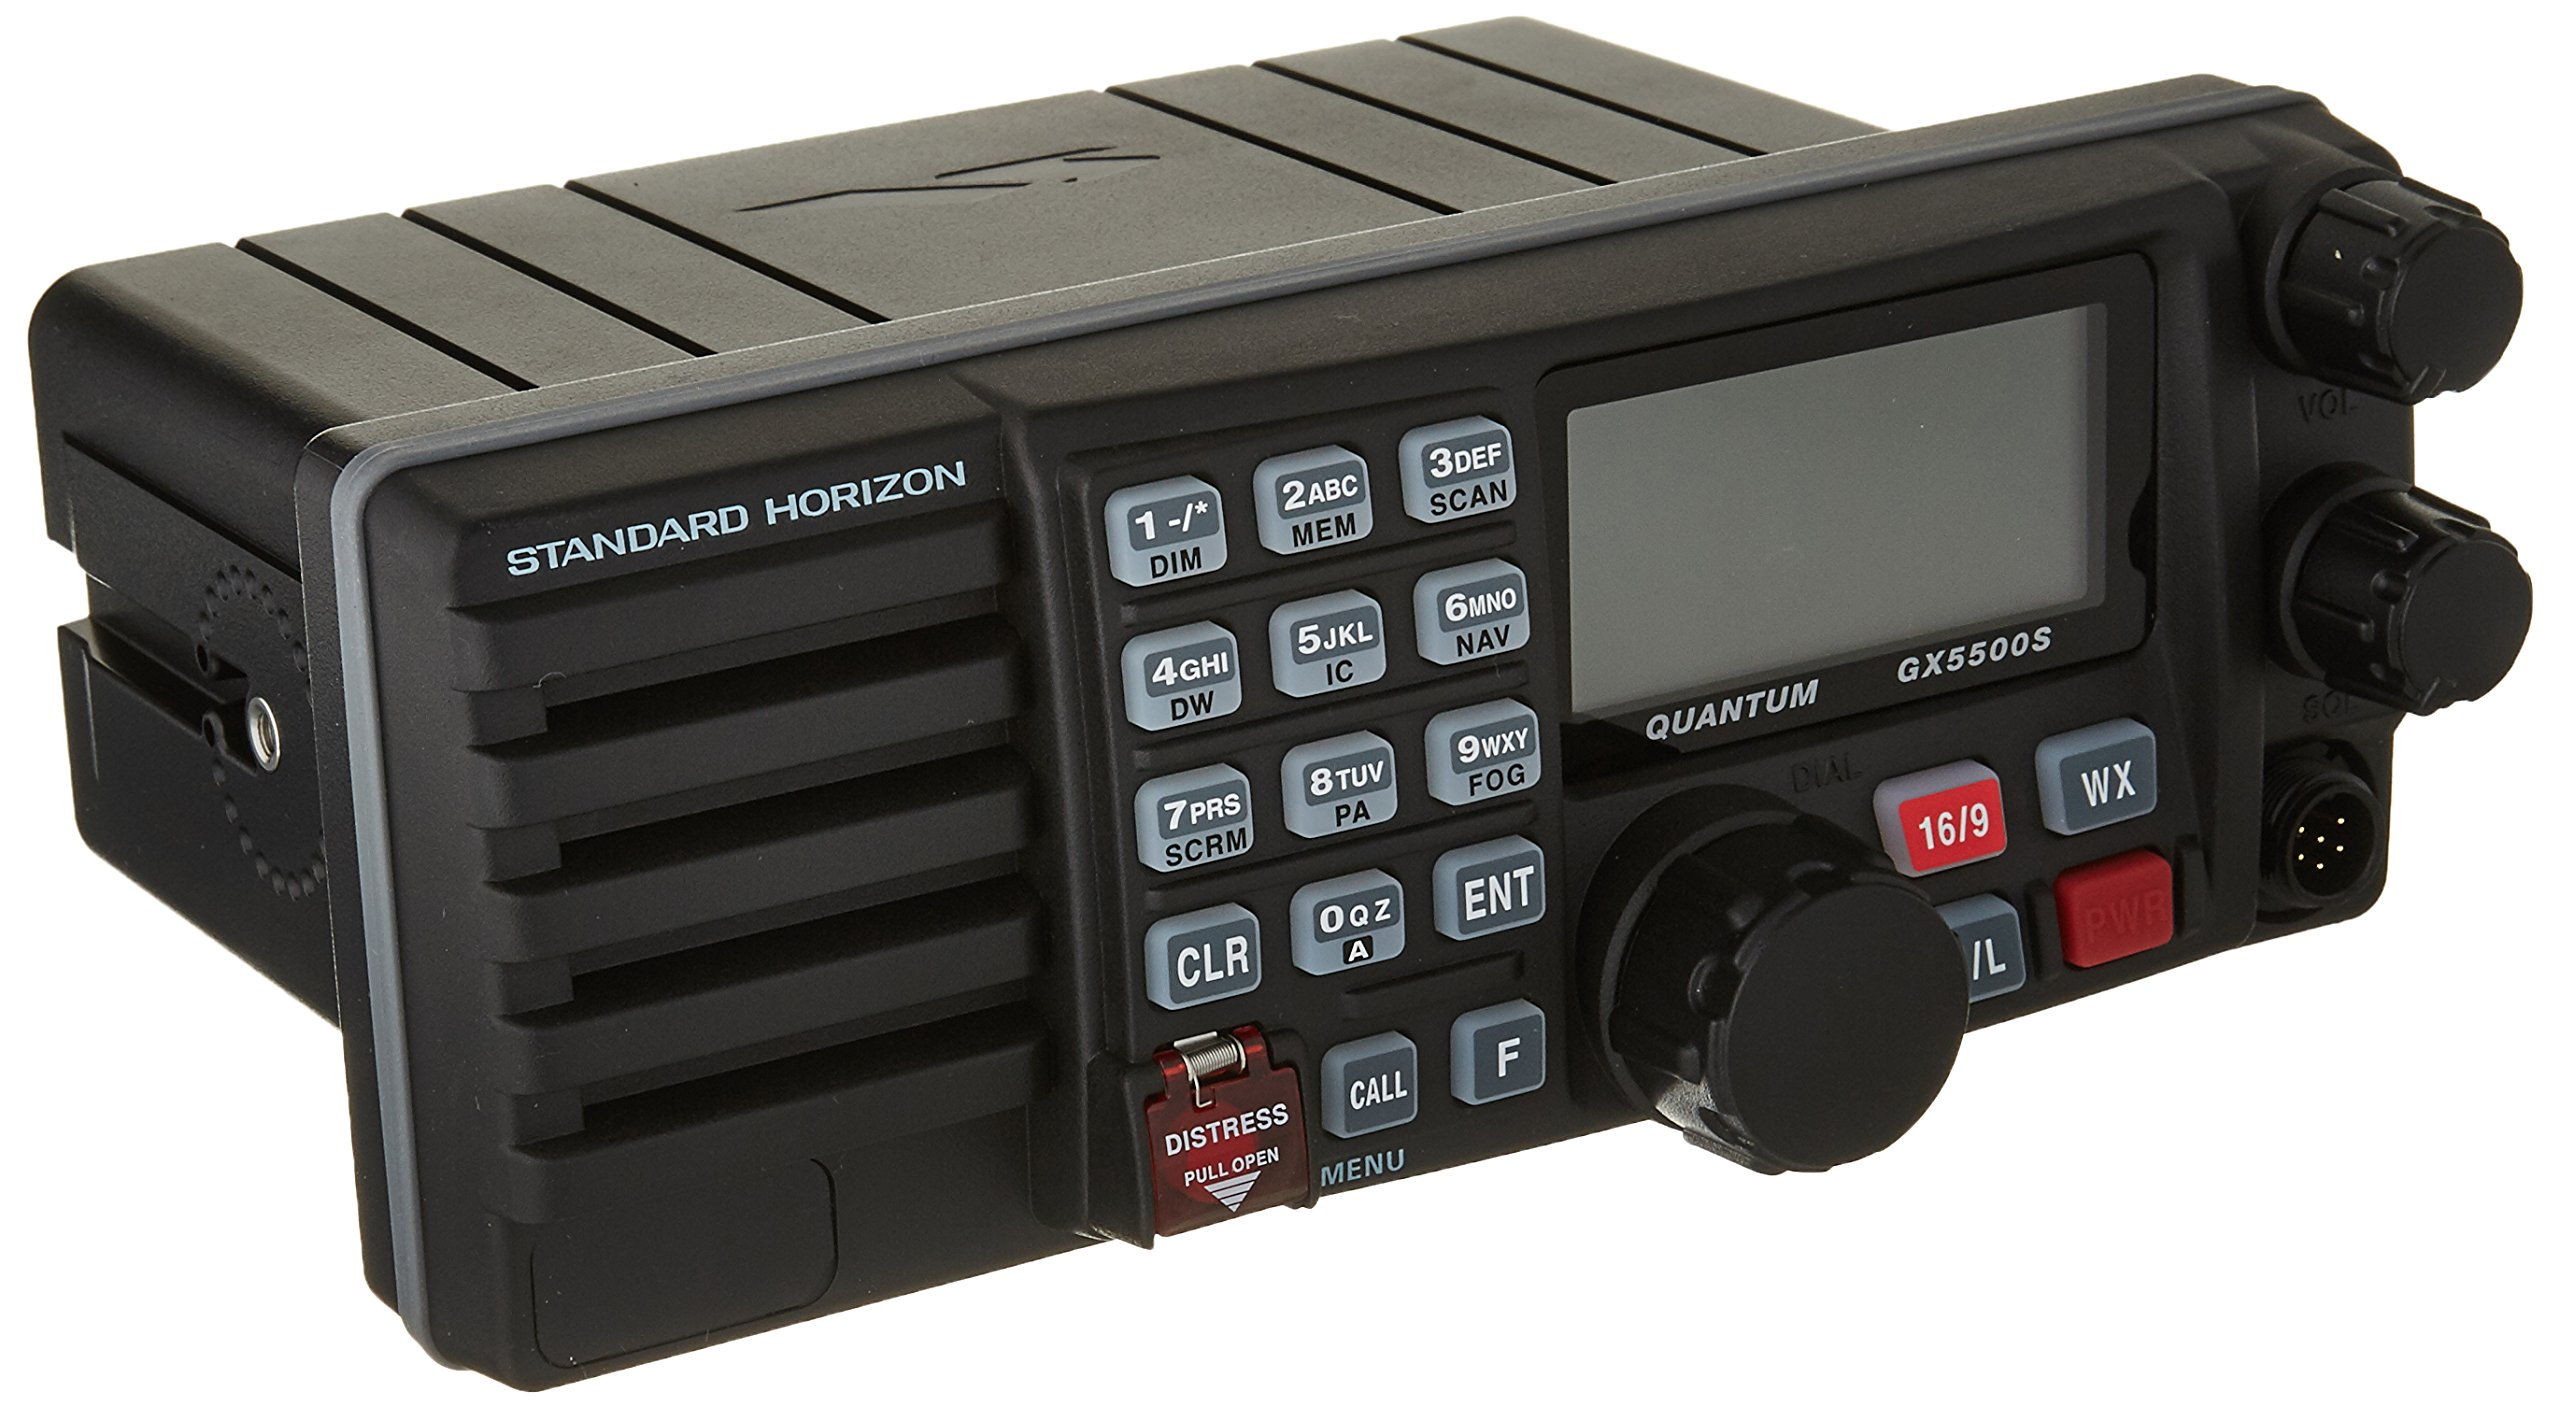 Standard Horizon GX5500S Standard Quantum VHF with Alphanumeric Keypad by Standard Horizon (Image #1)